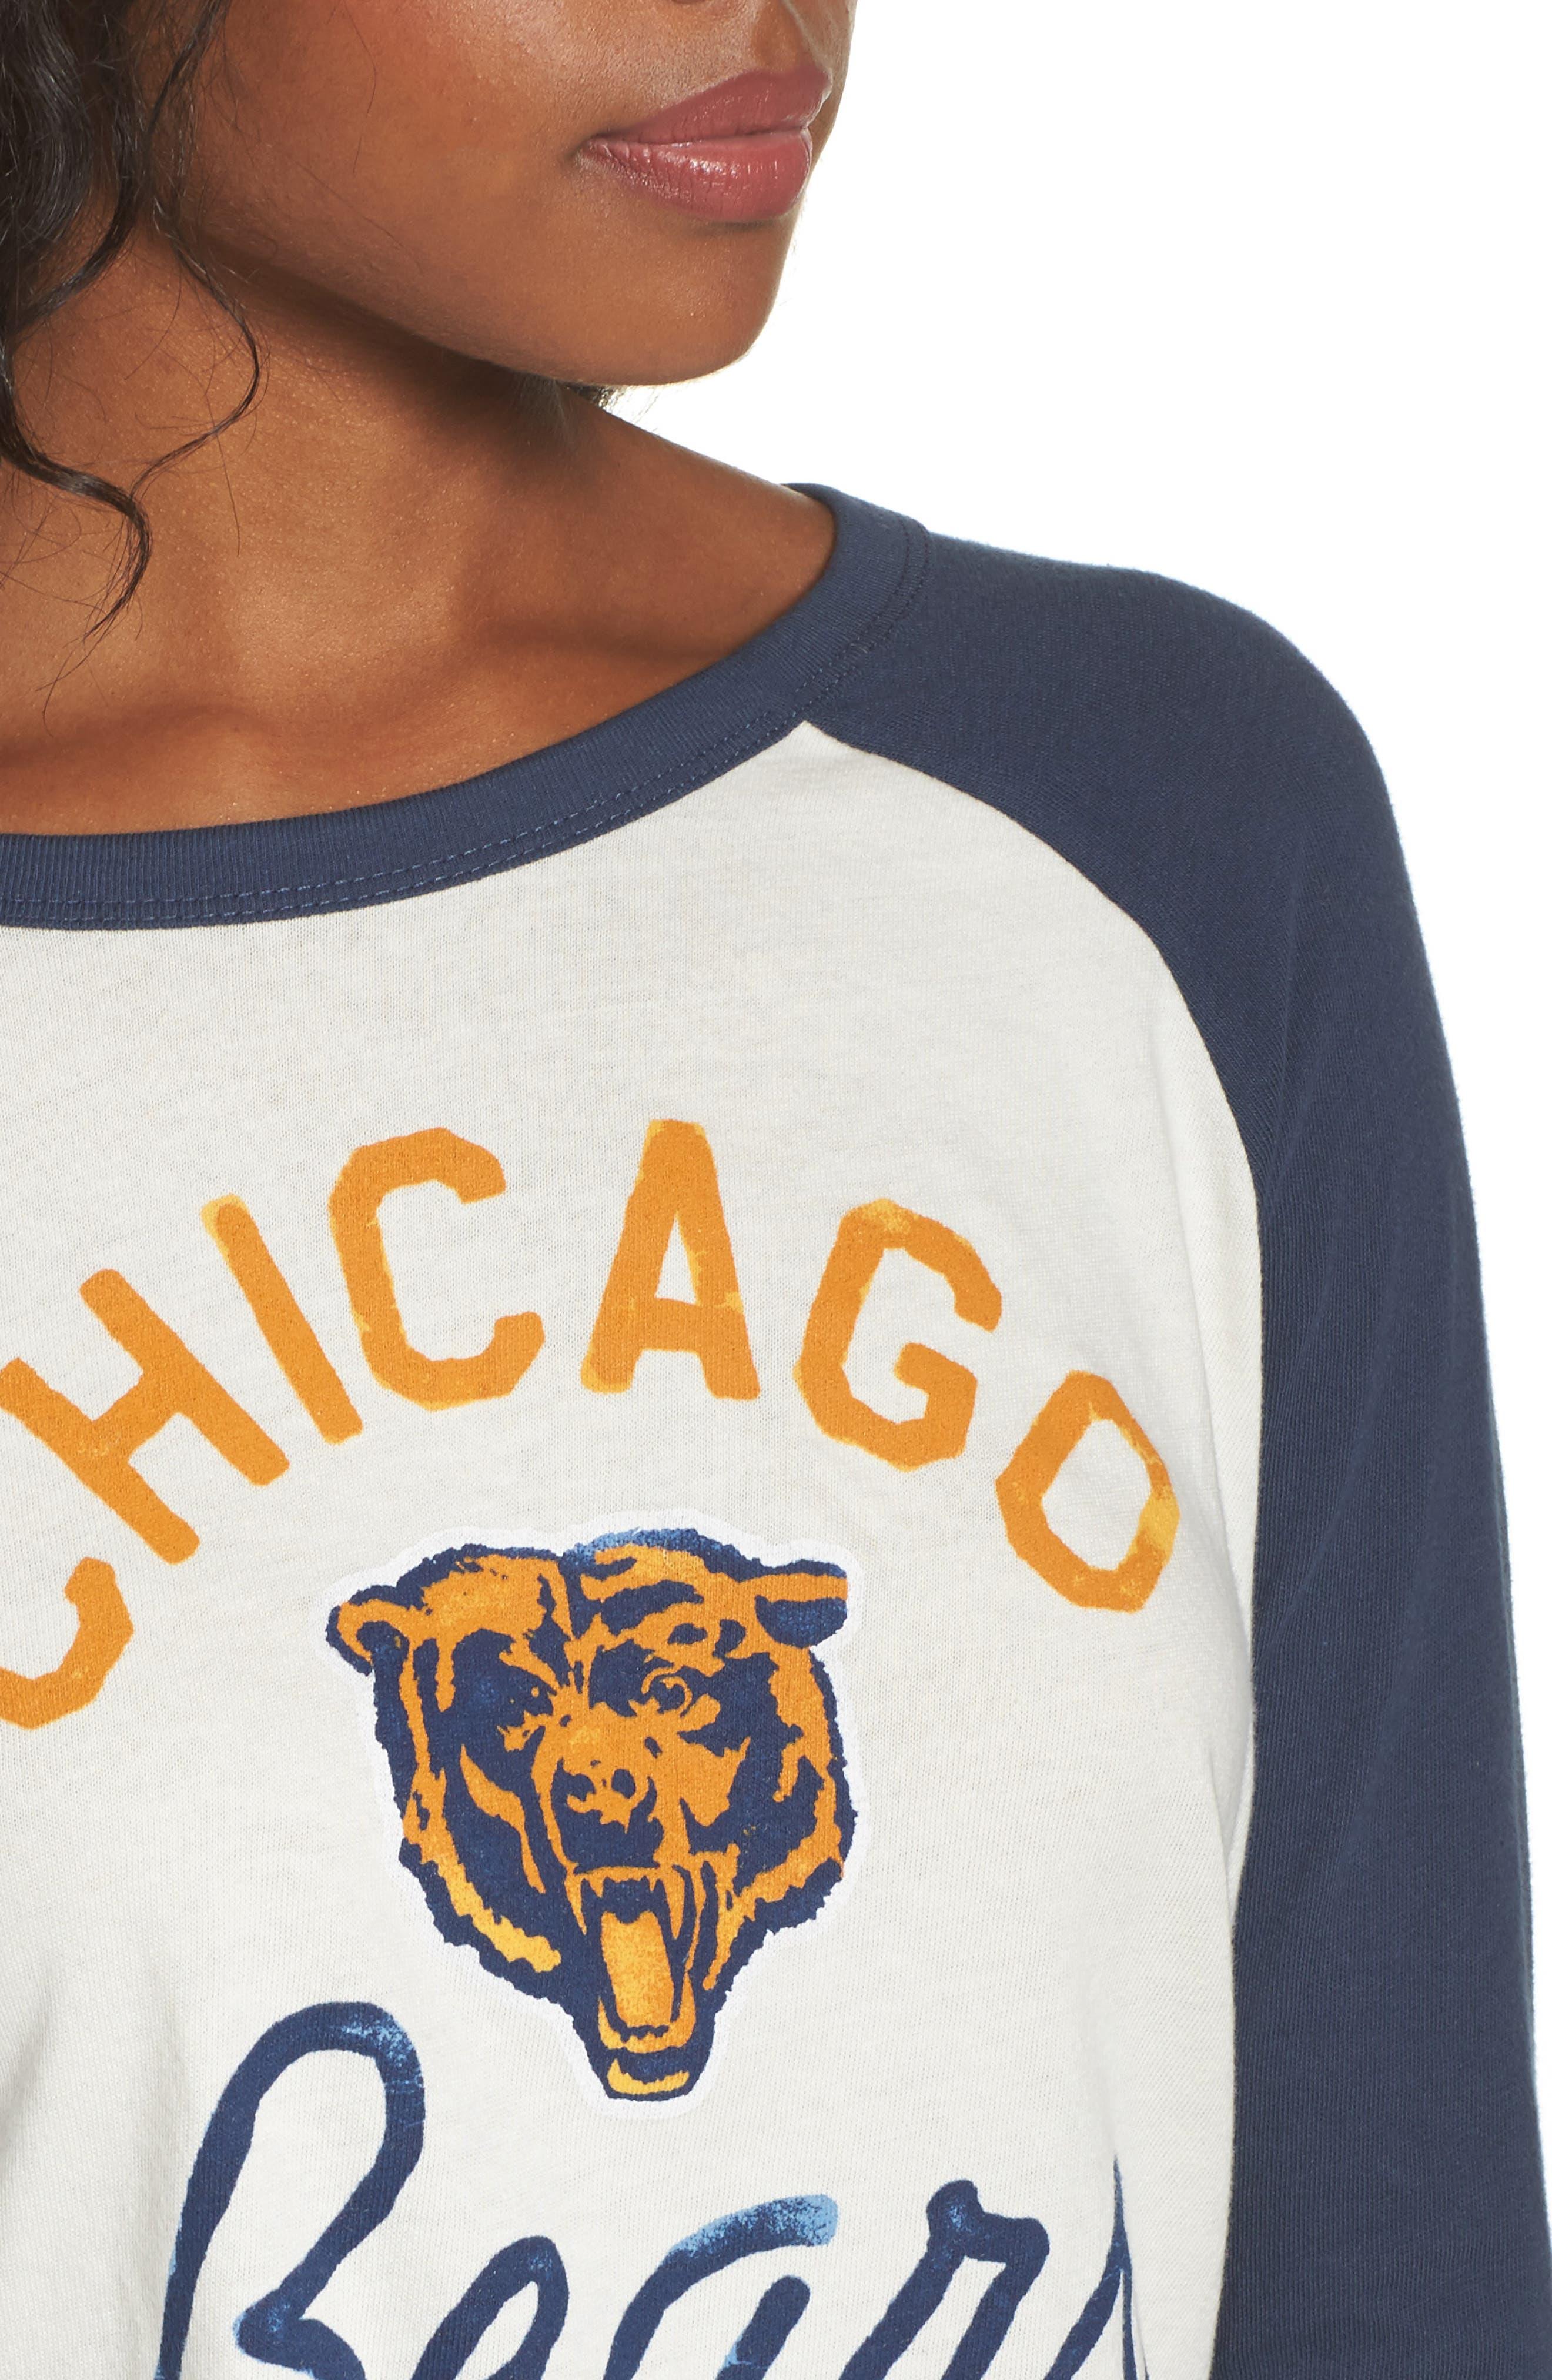 NFL Chicago Bears Raglan Tee,                             Alternate thumbnail 4, color,                             Sugar/ True Navy